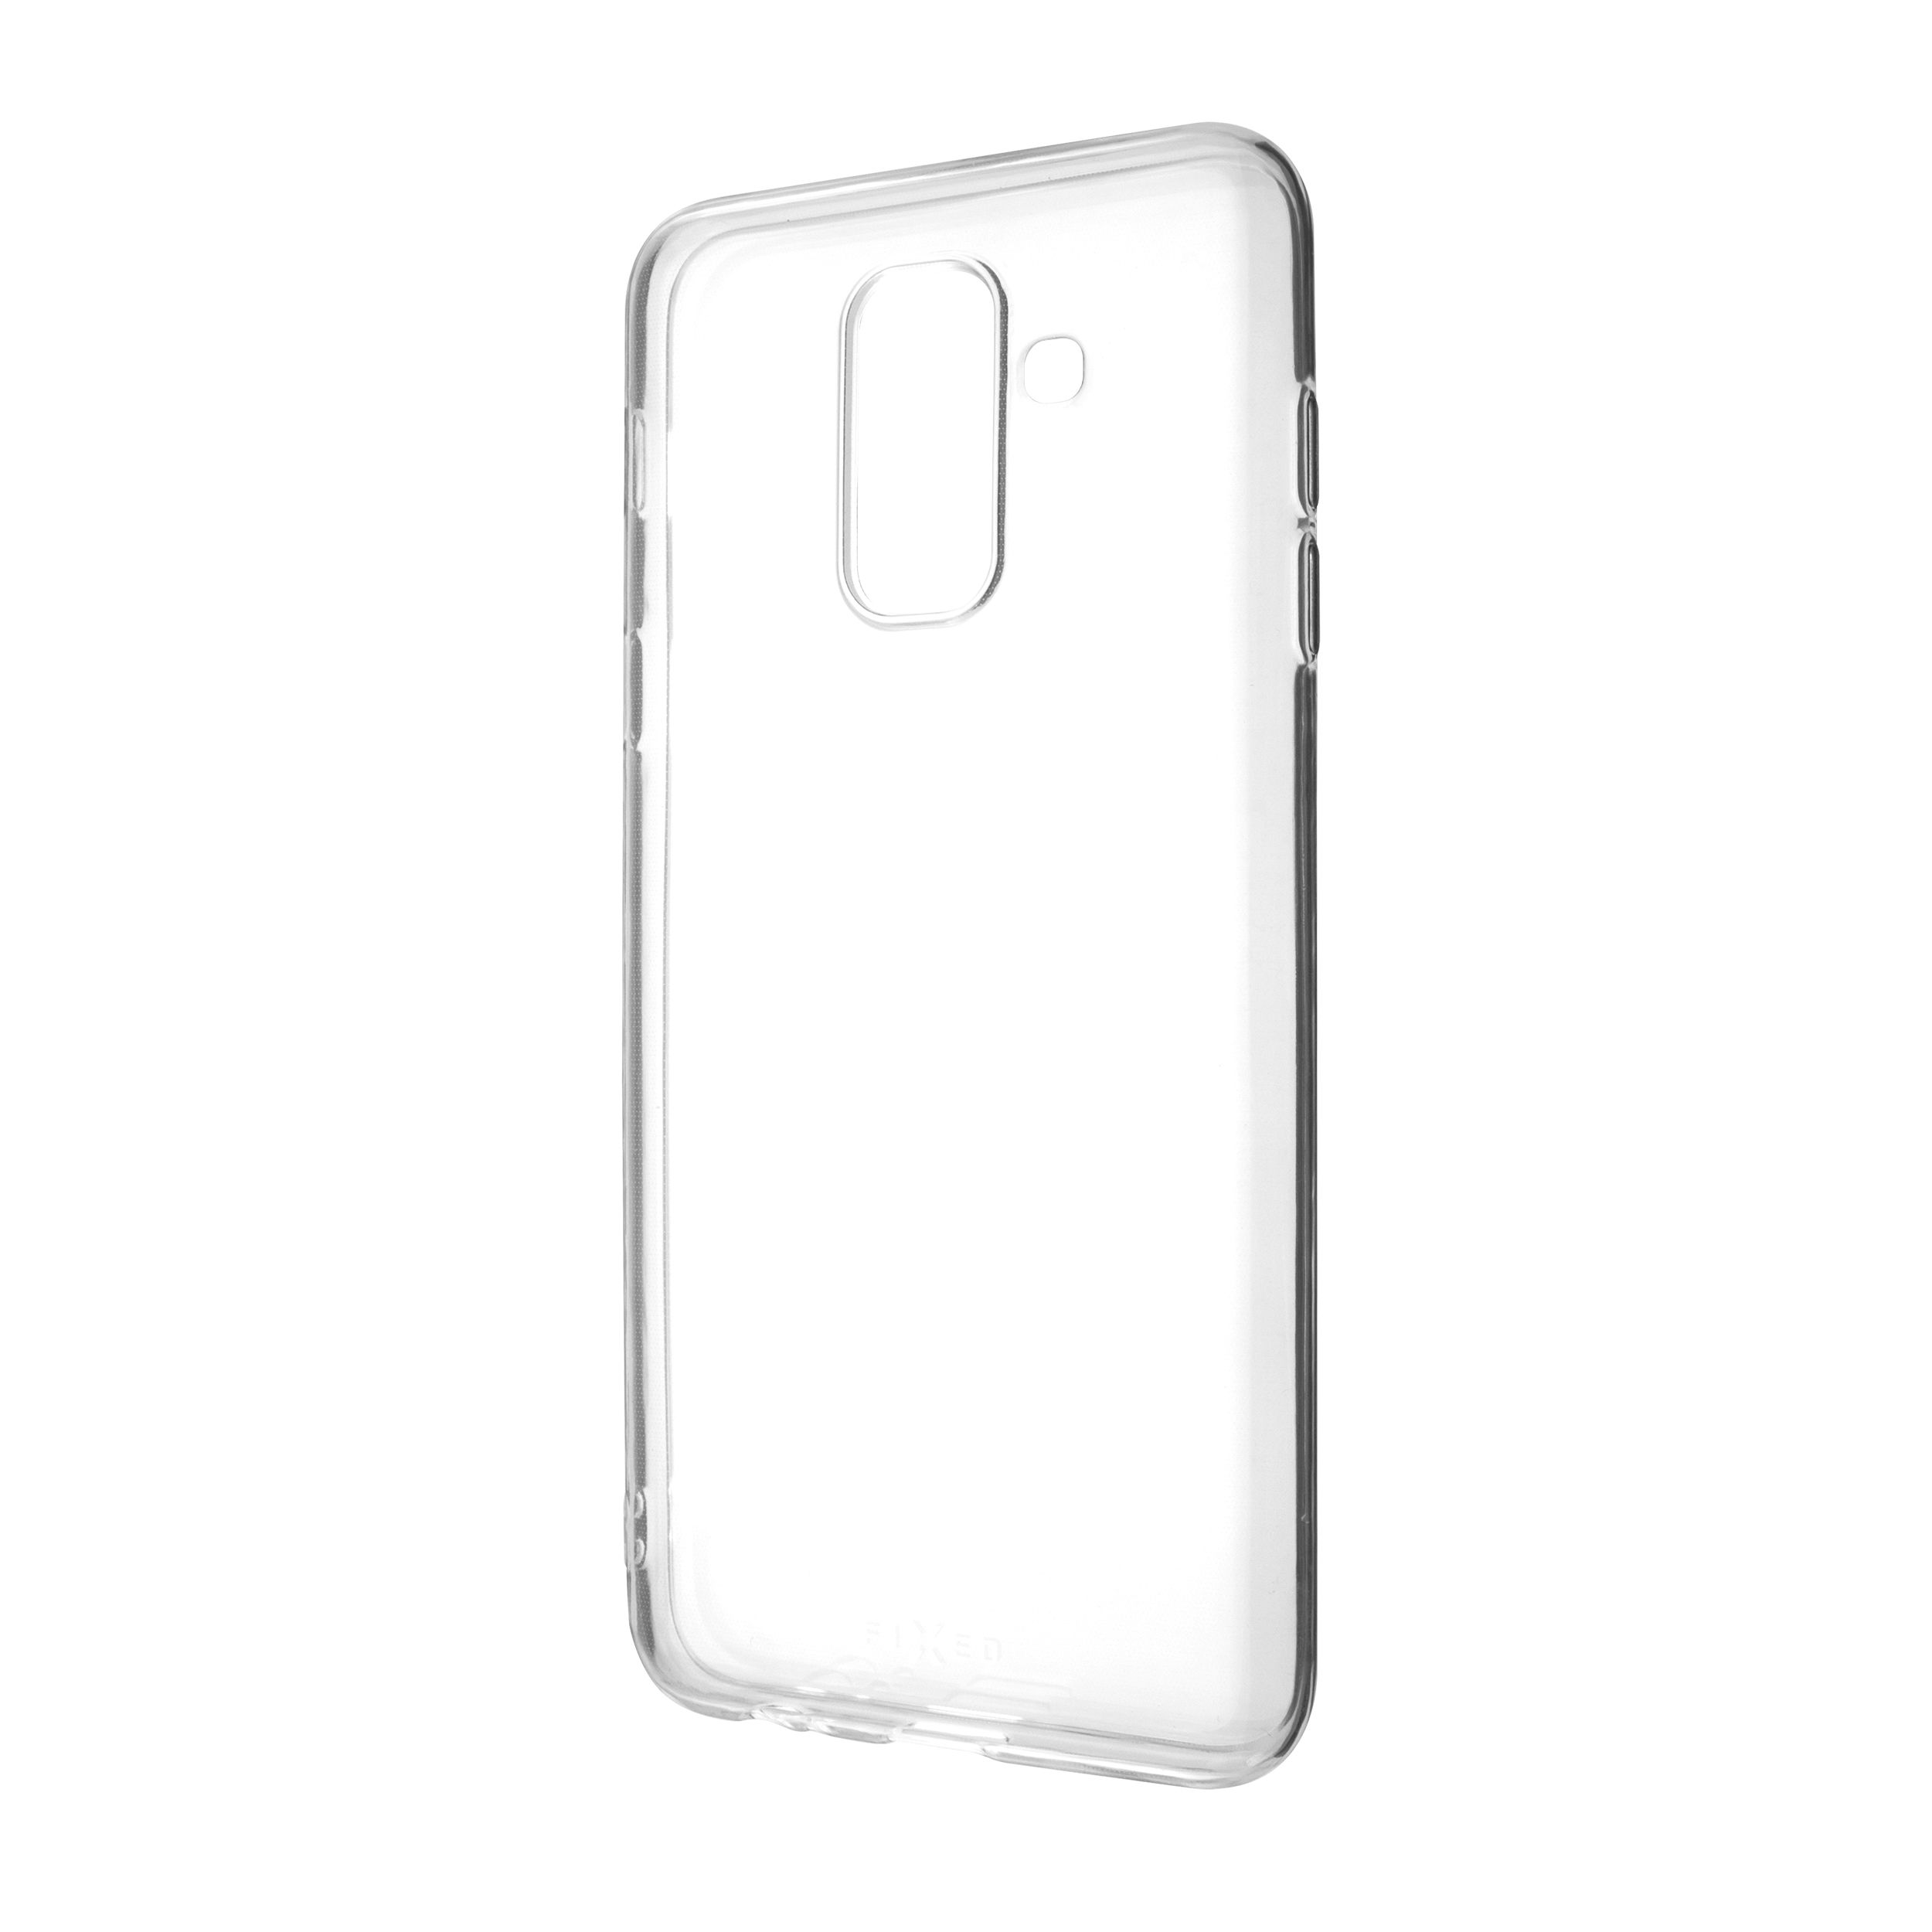 Ultratenké TPU gelové pouzdro FIXED Skin pro Samsung Galaxy A6+ (2018), 0,6 mm, čiré